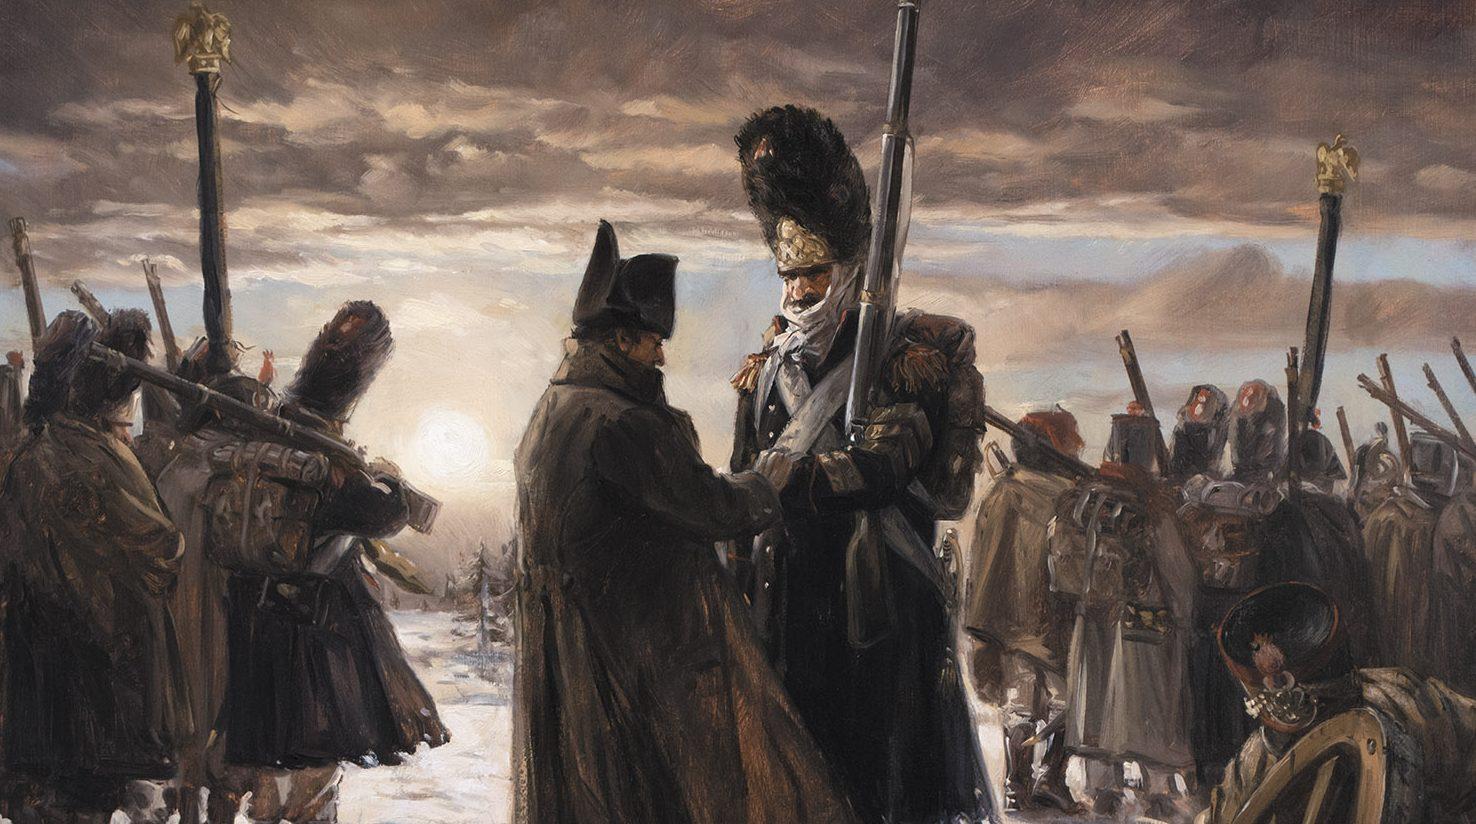 #Critique Champs d'honneur – La Bérézina (novembre 1812)